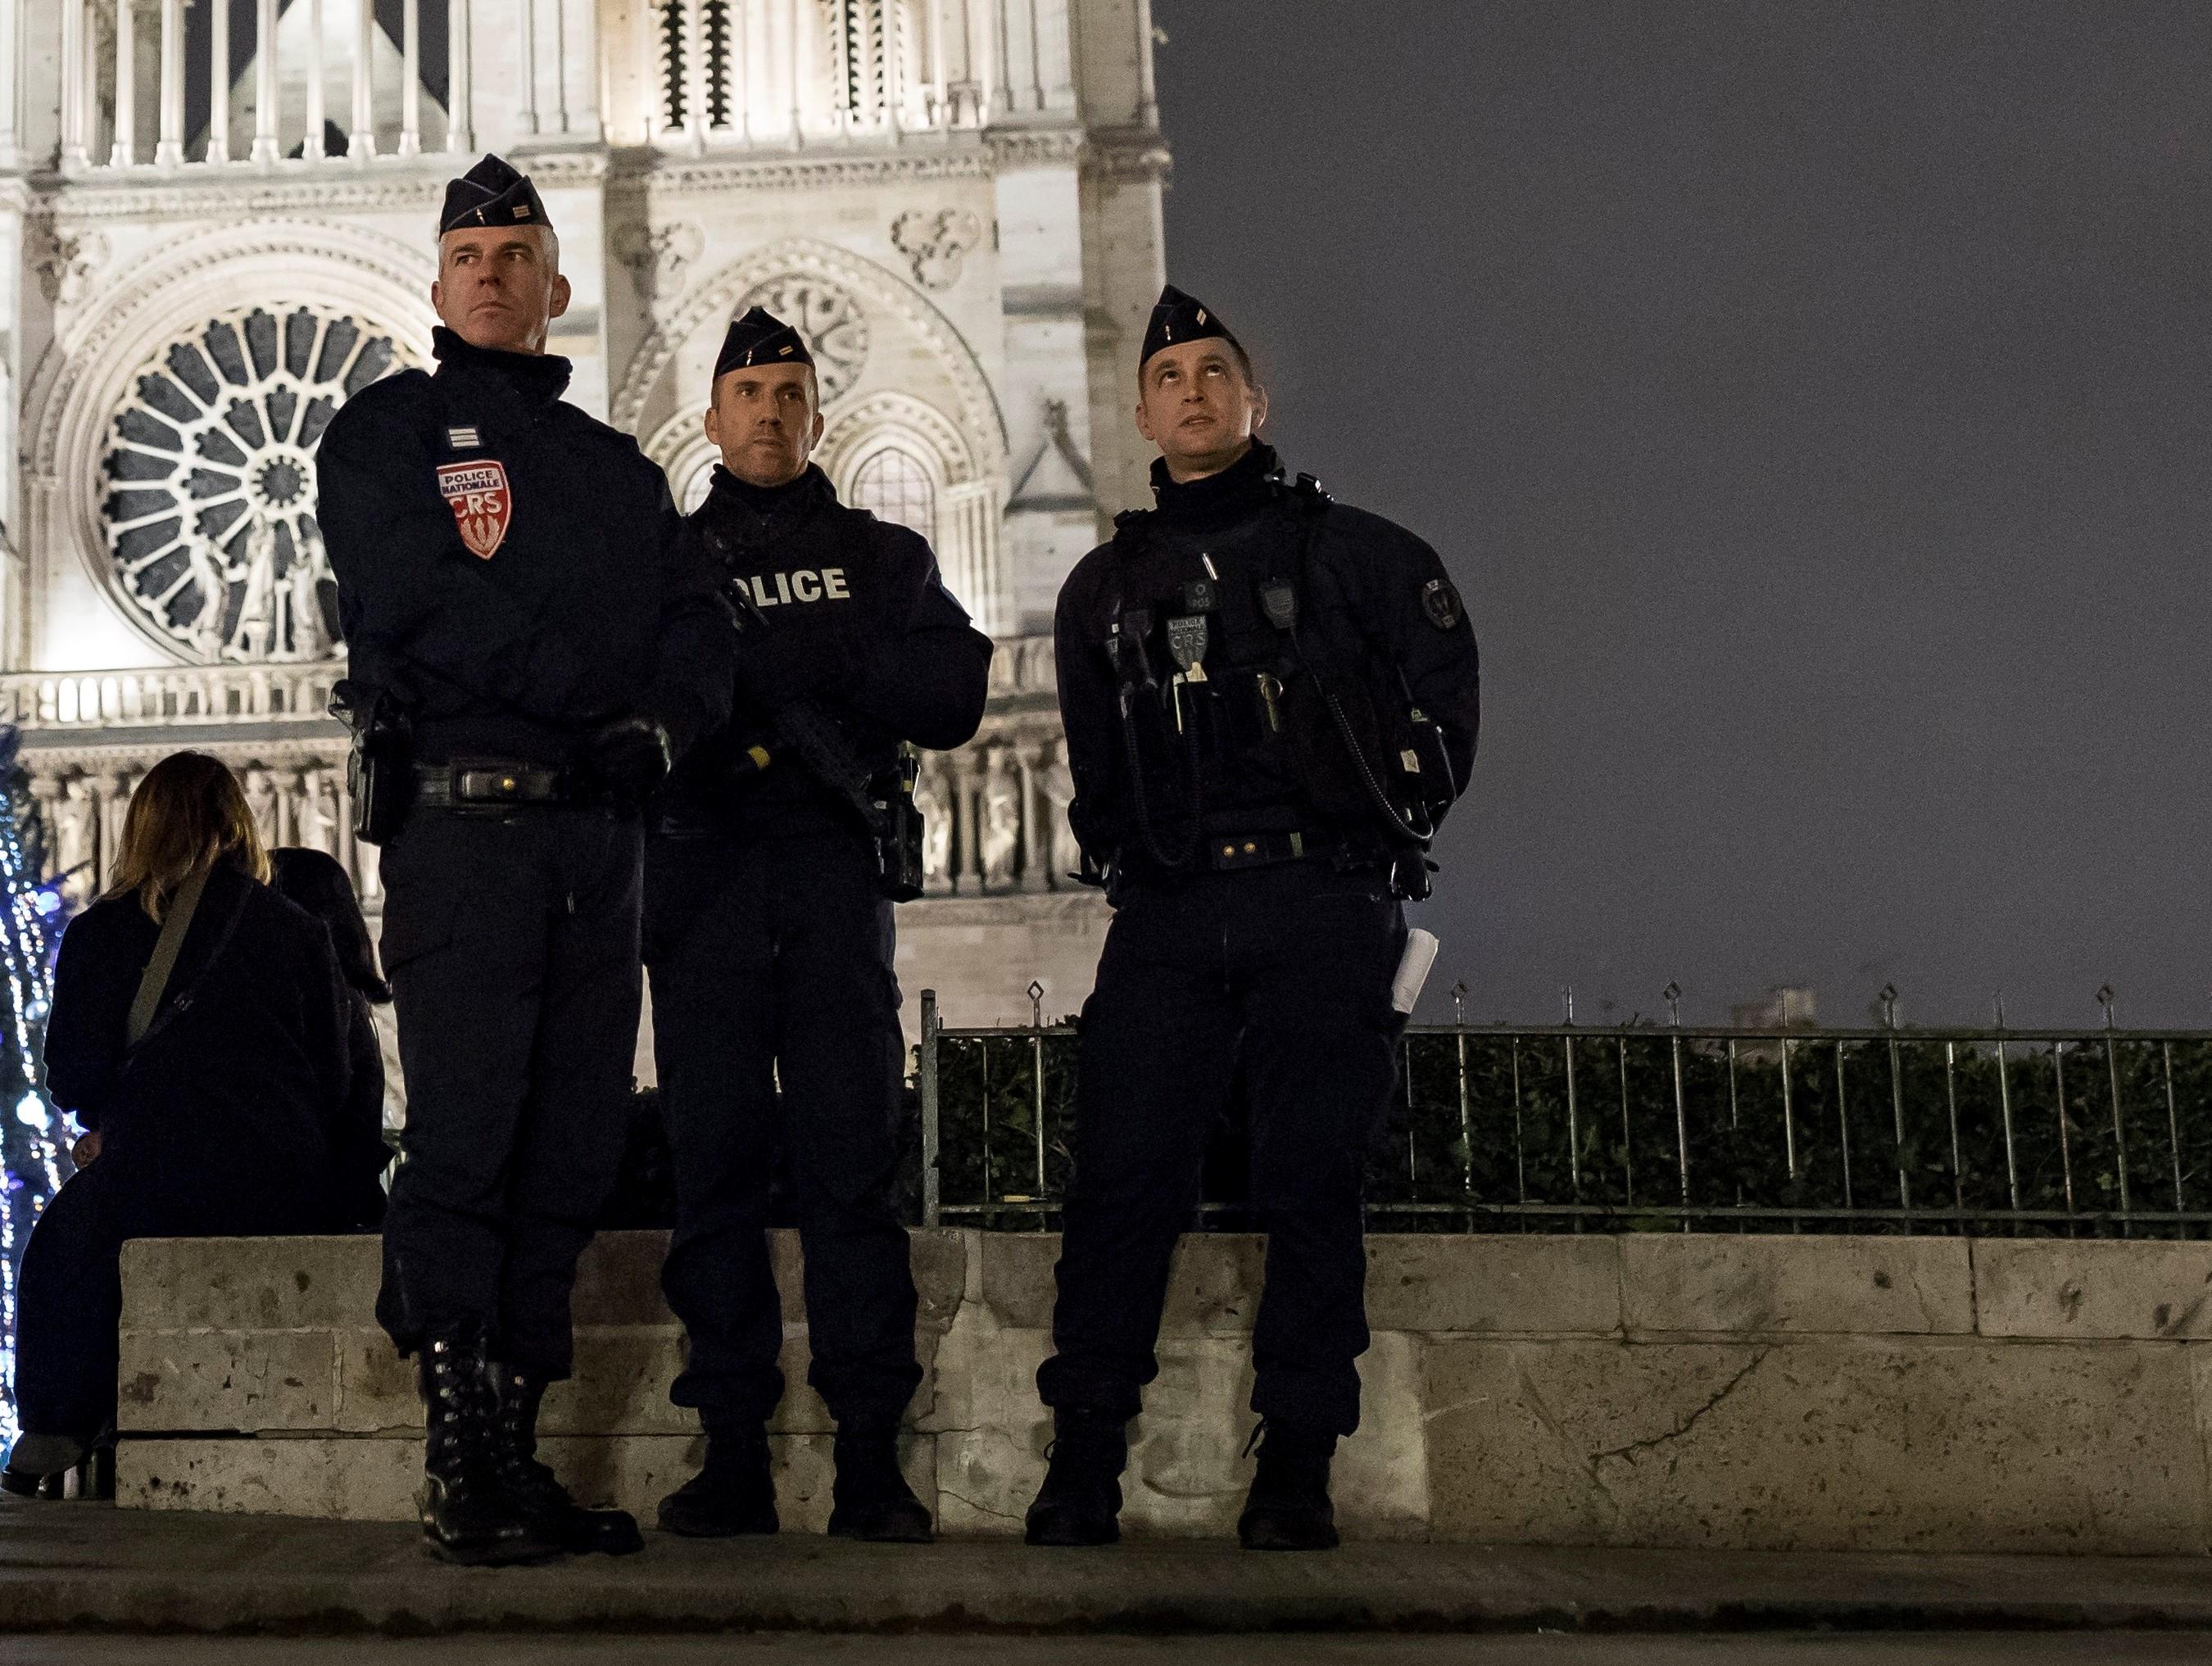 Europa čeka Novu godinu oprezno